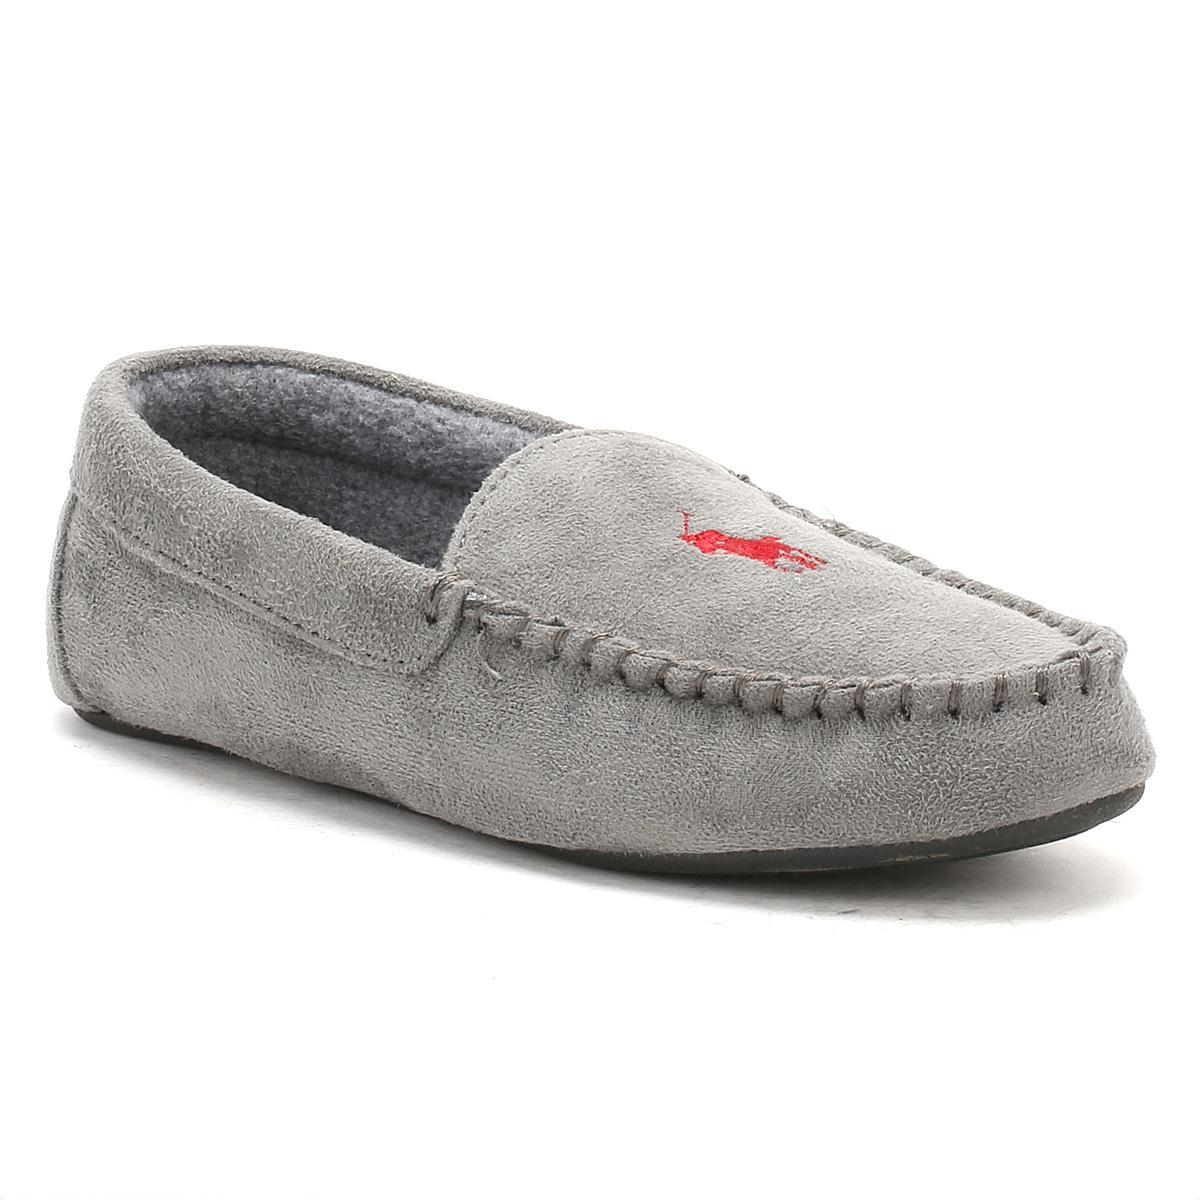 99bb08b0a Ralph Lauren Mens Grey / Burgundy Dezi Ii Moccasin Slippers in Gray ...